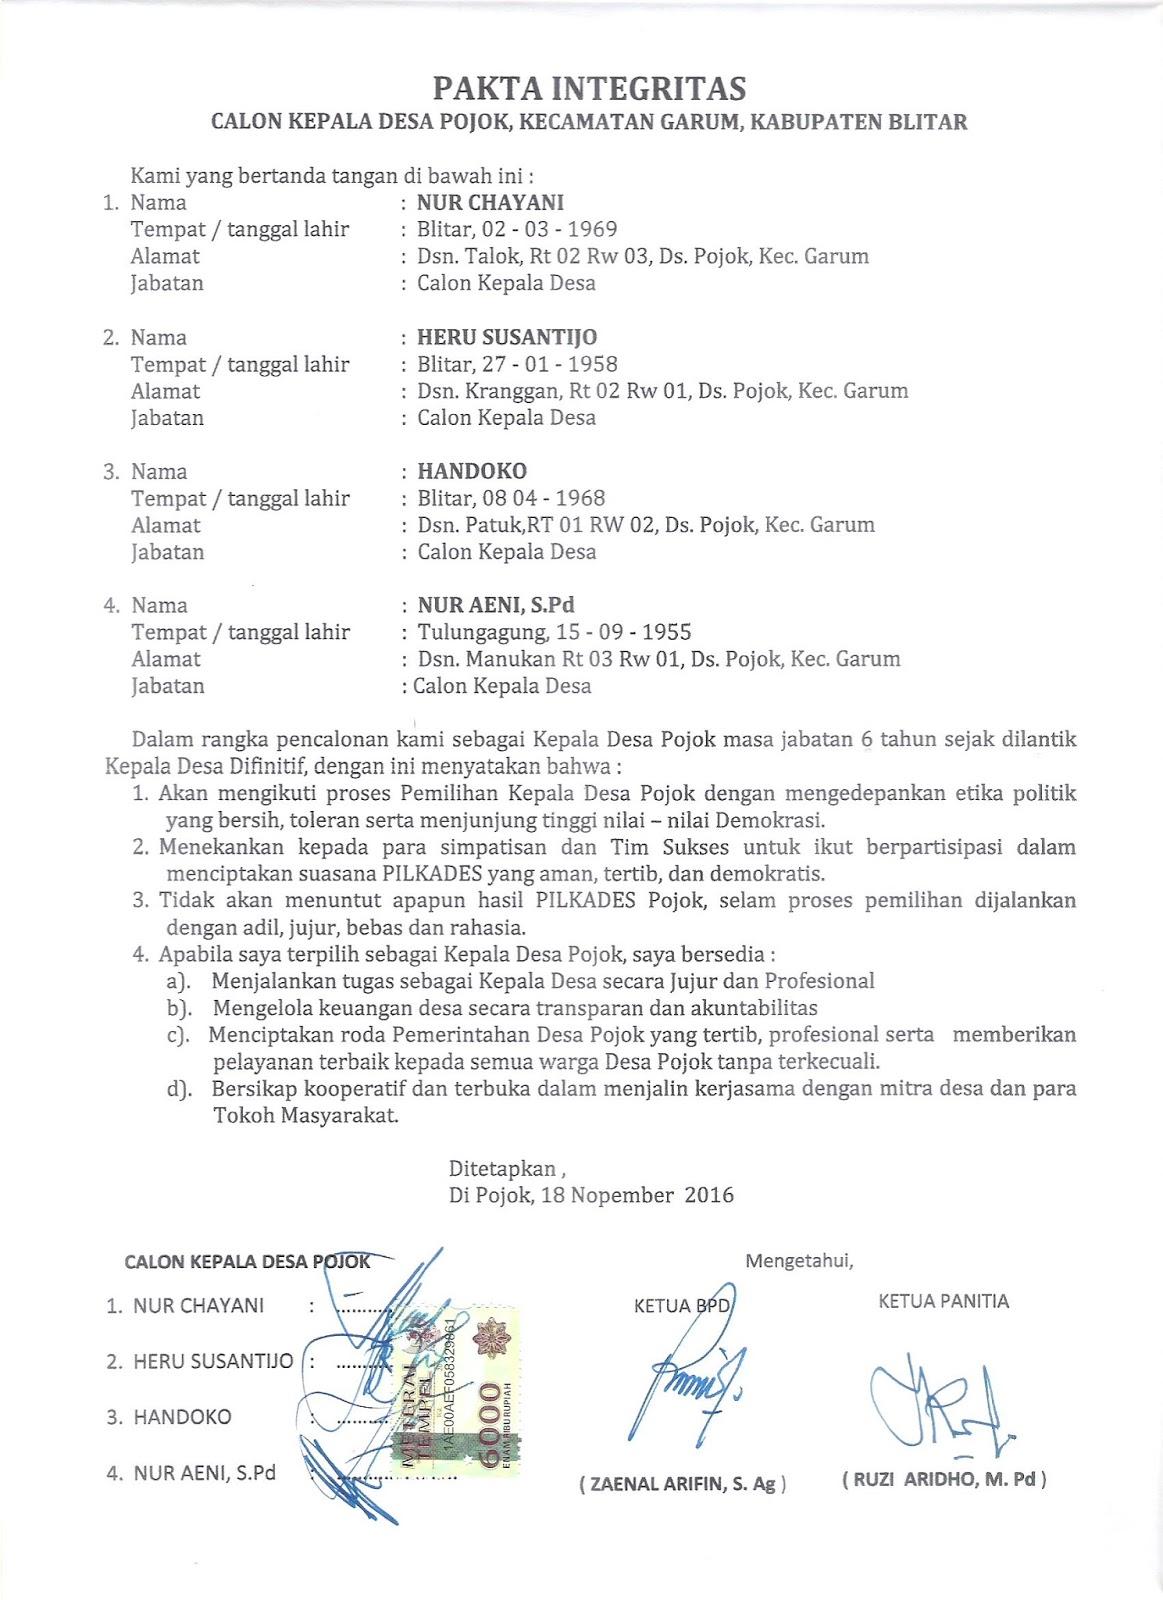 ppkgarum pakta integritas calon kepala desa pojok